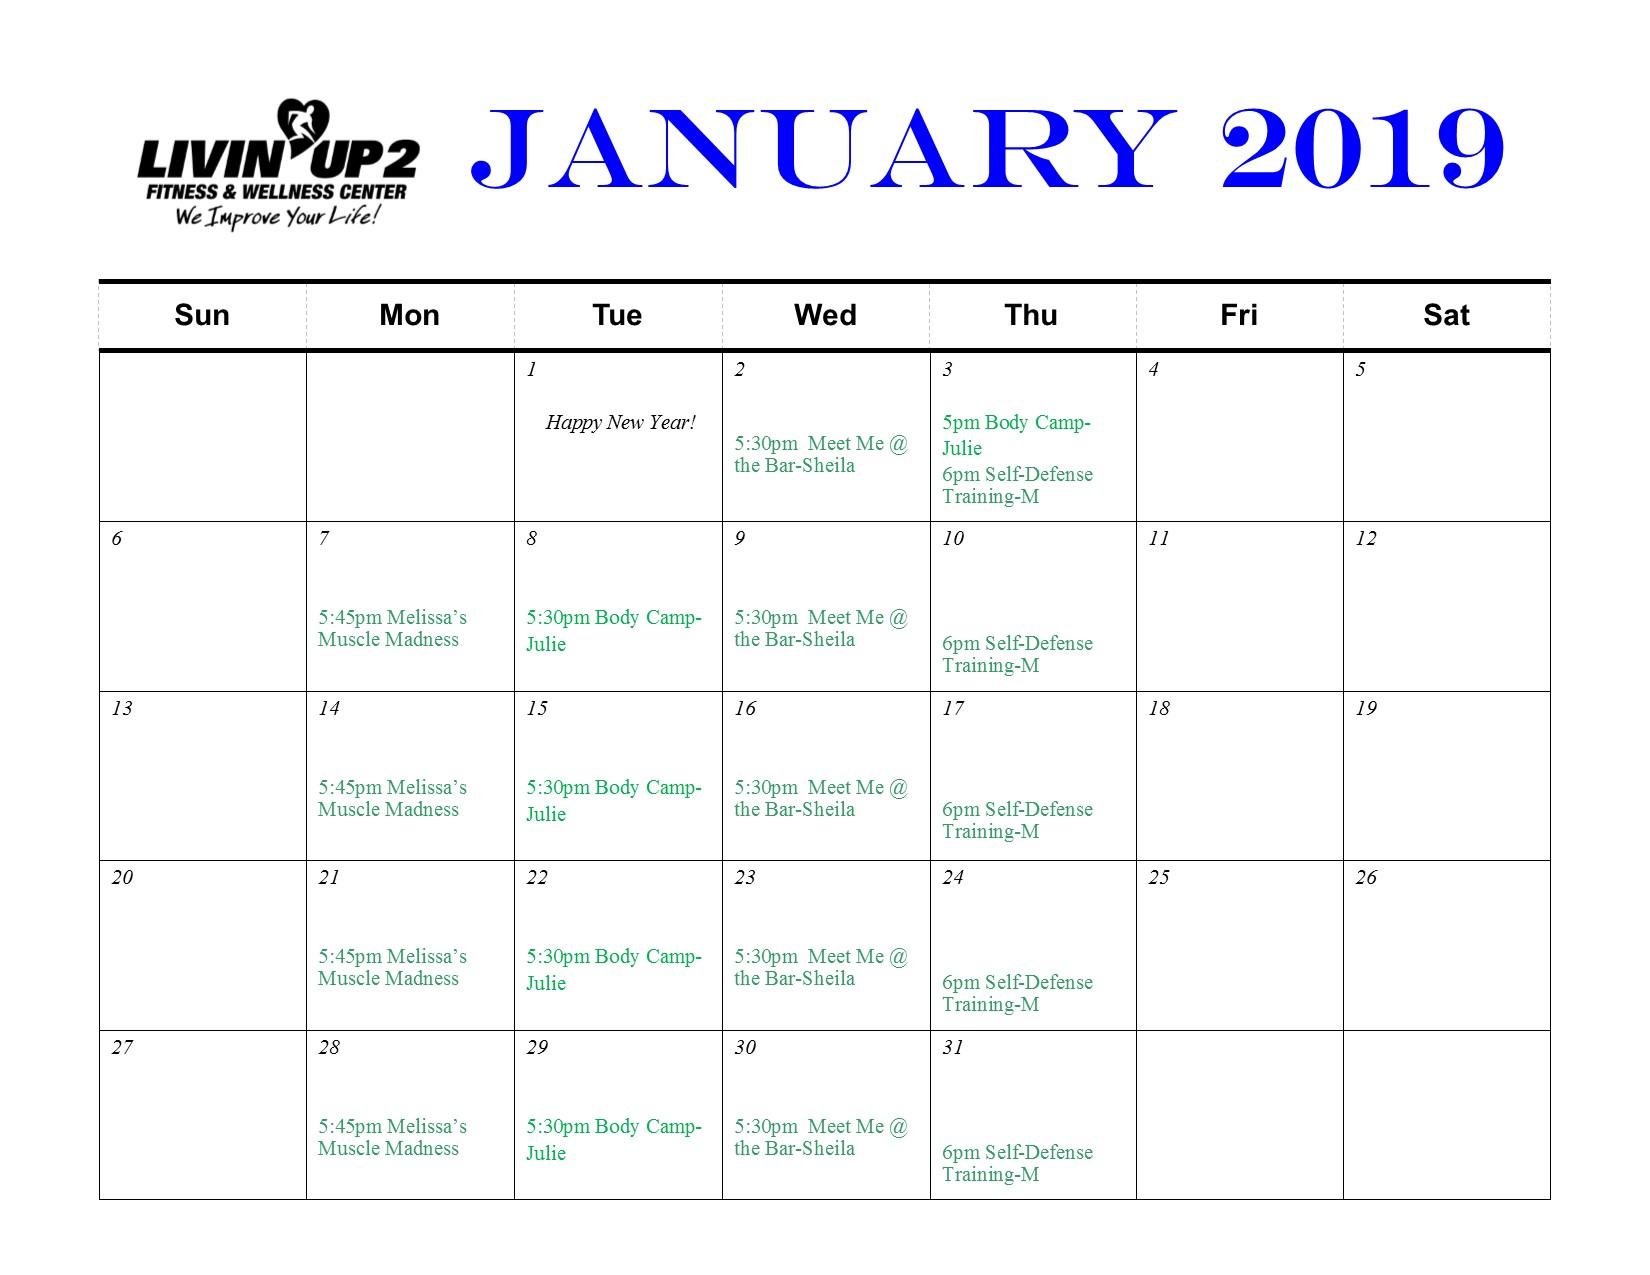 January 2019 GF Schedule